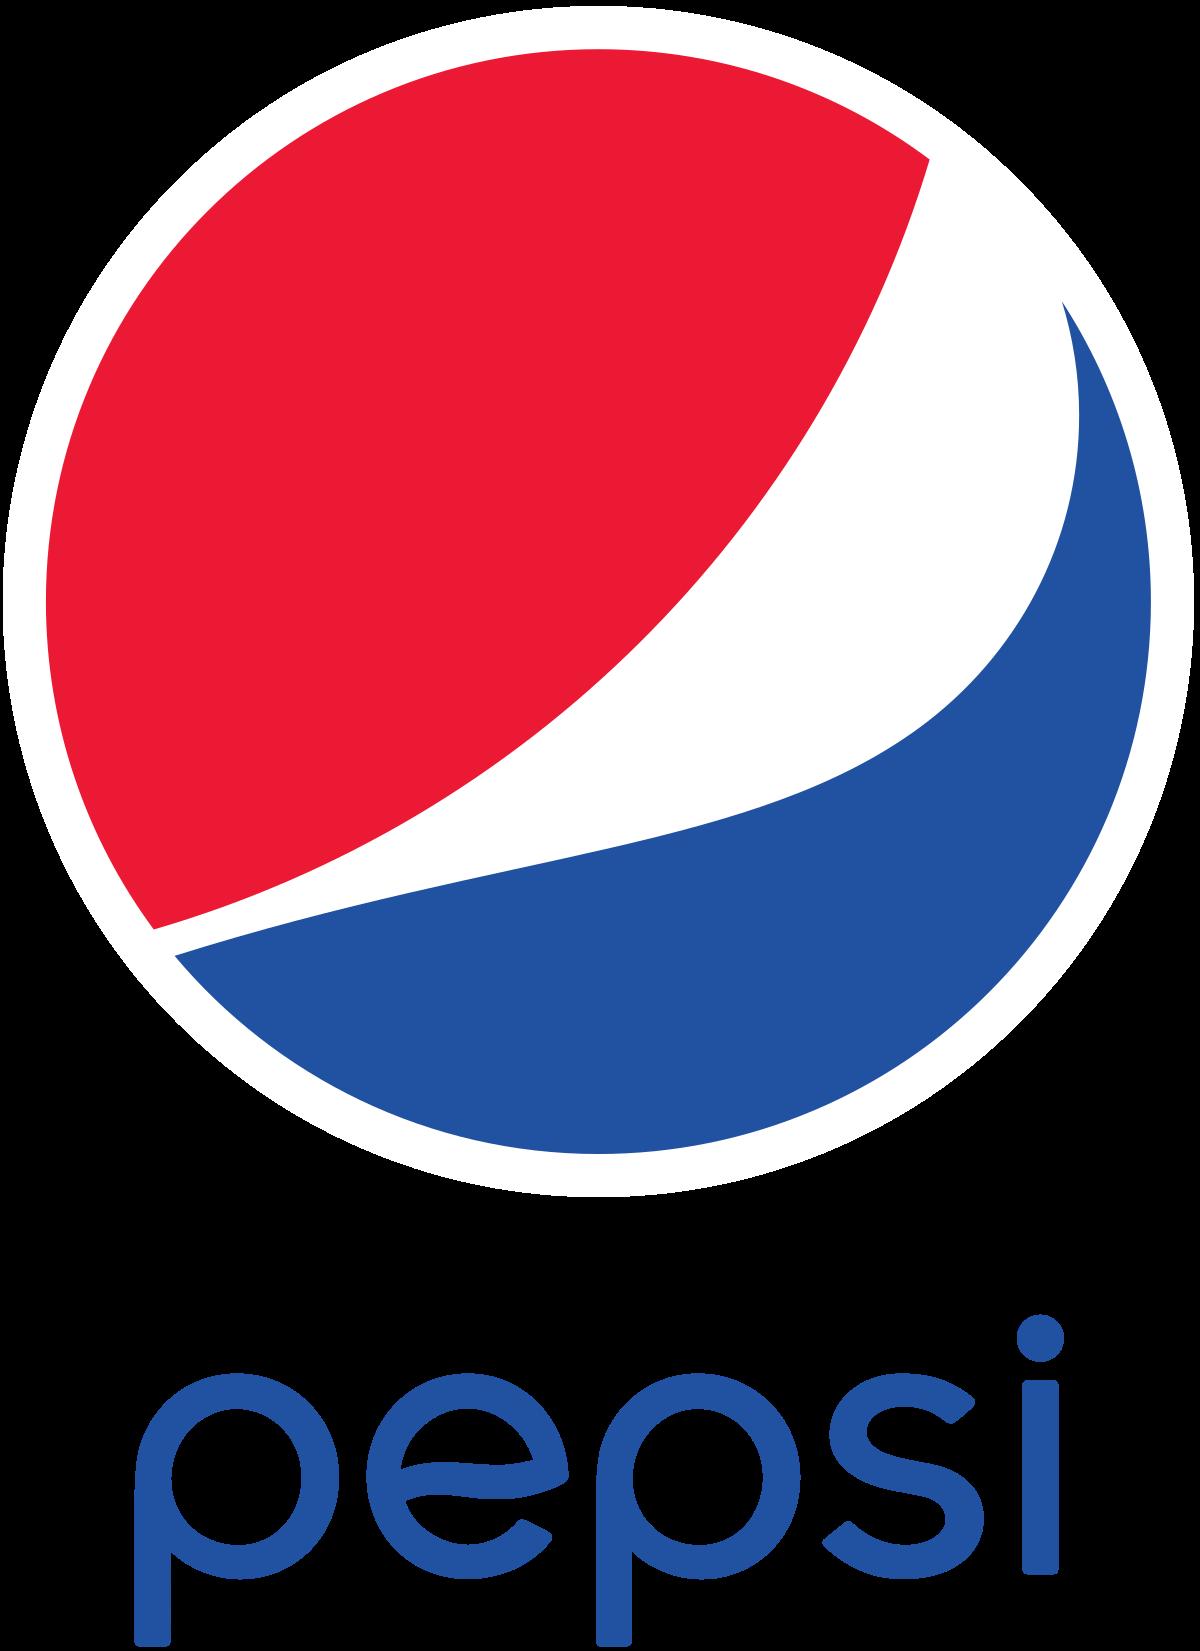 Pepsi Globe.